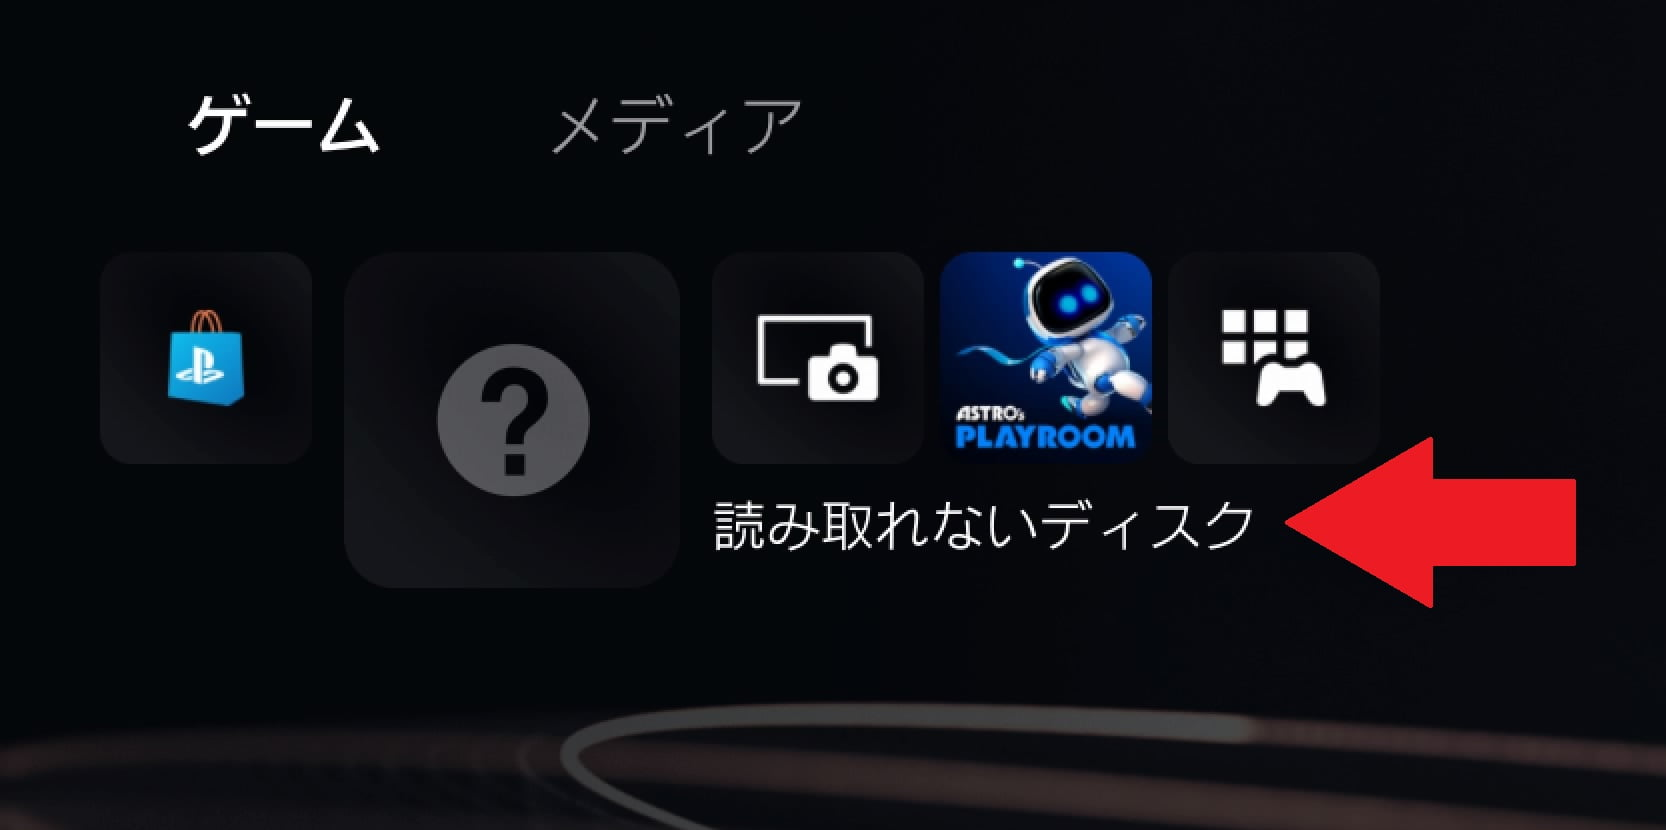 PS5の「読み込めないディスク」の表記